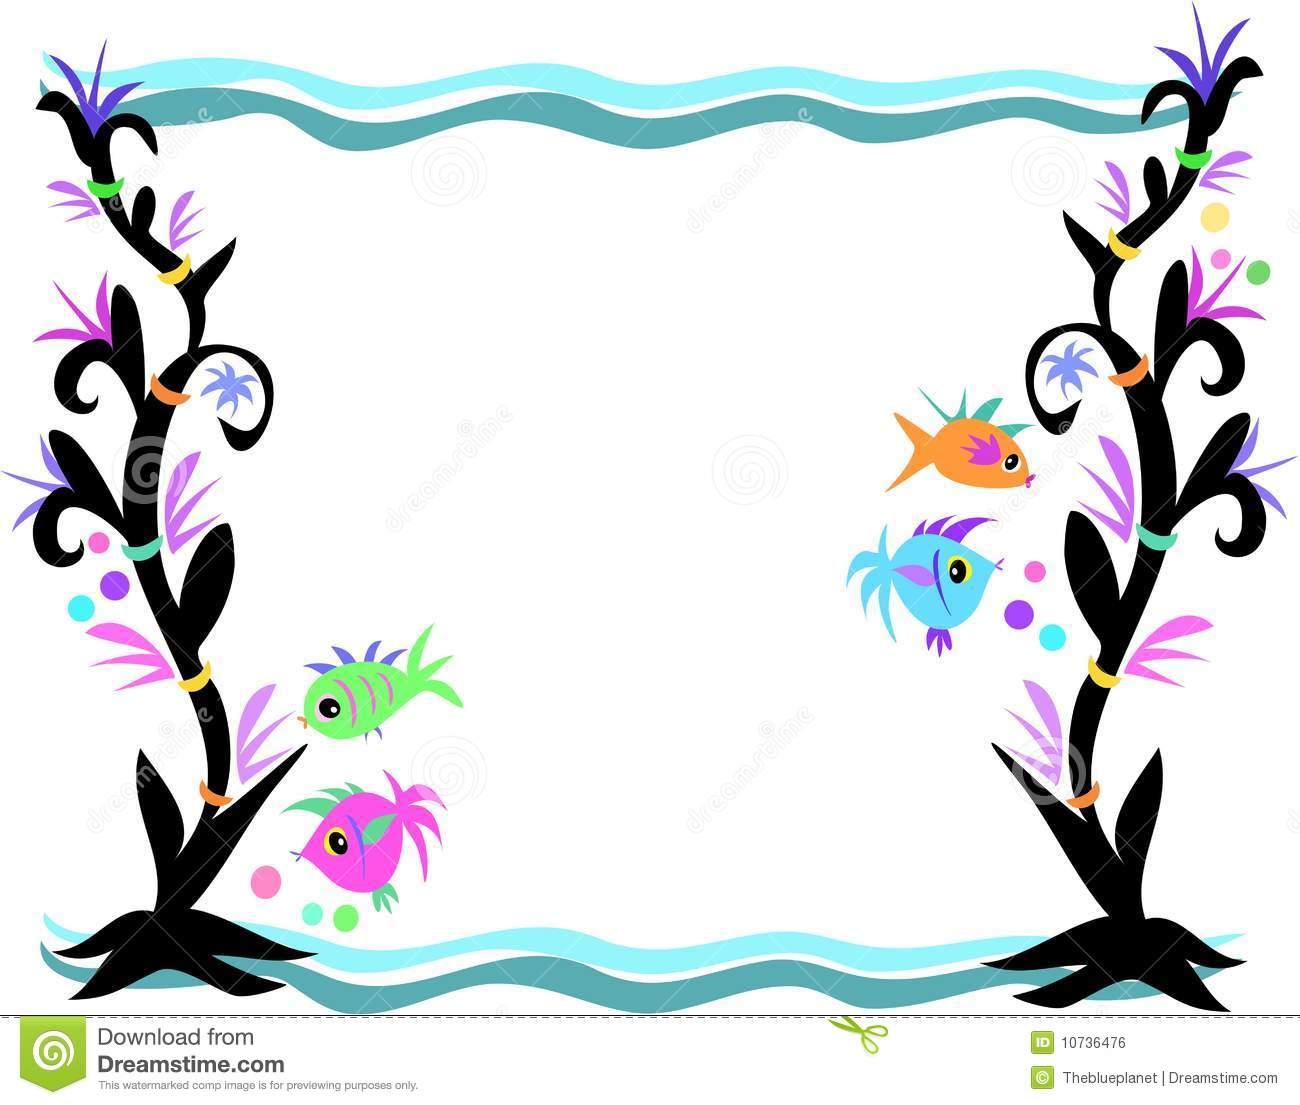 Mermaid clipart border Clipart Clipart Border Music Seaweed